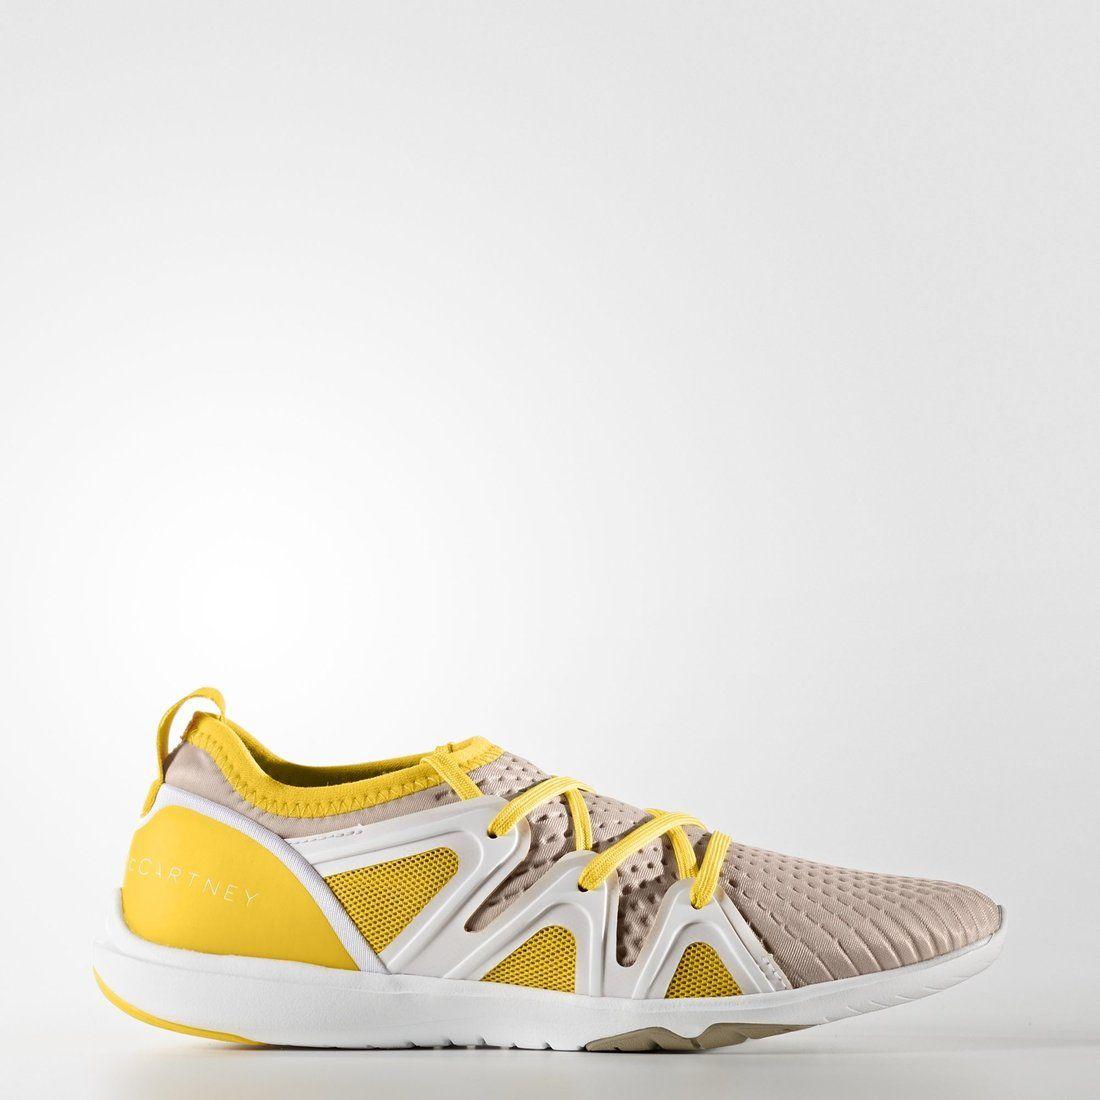 uk availability 79944 47a1e ... cheap adidas crazymove pro shoe 9995 gbp f6805 a8542